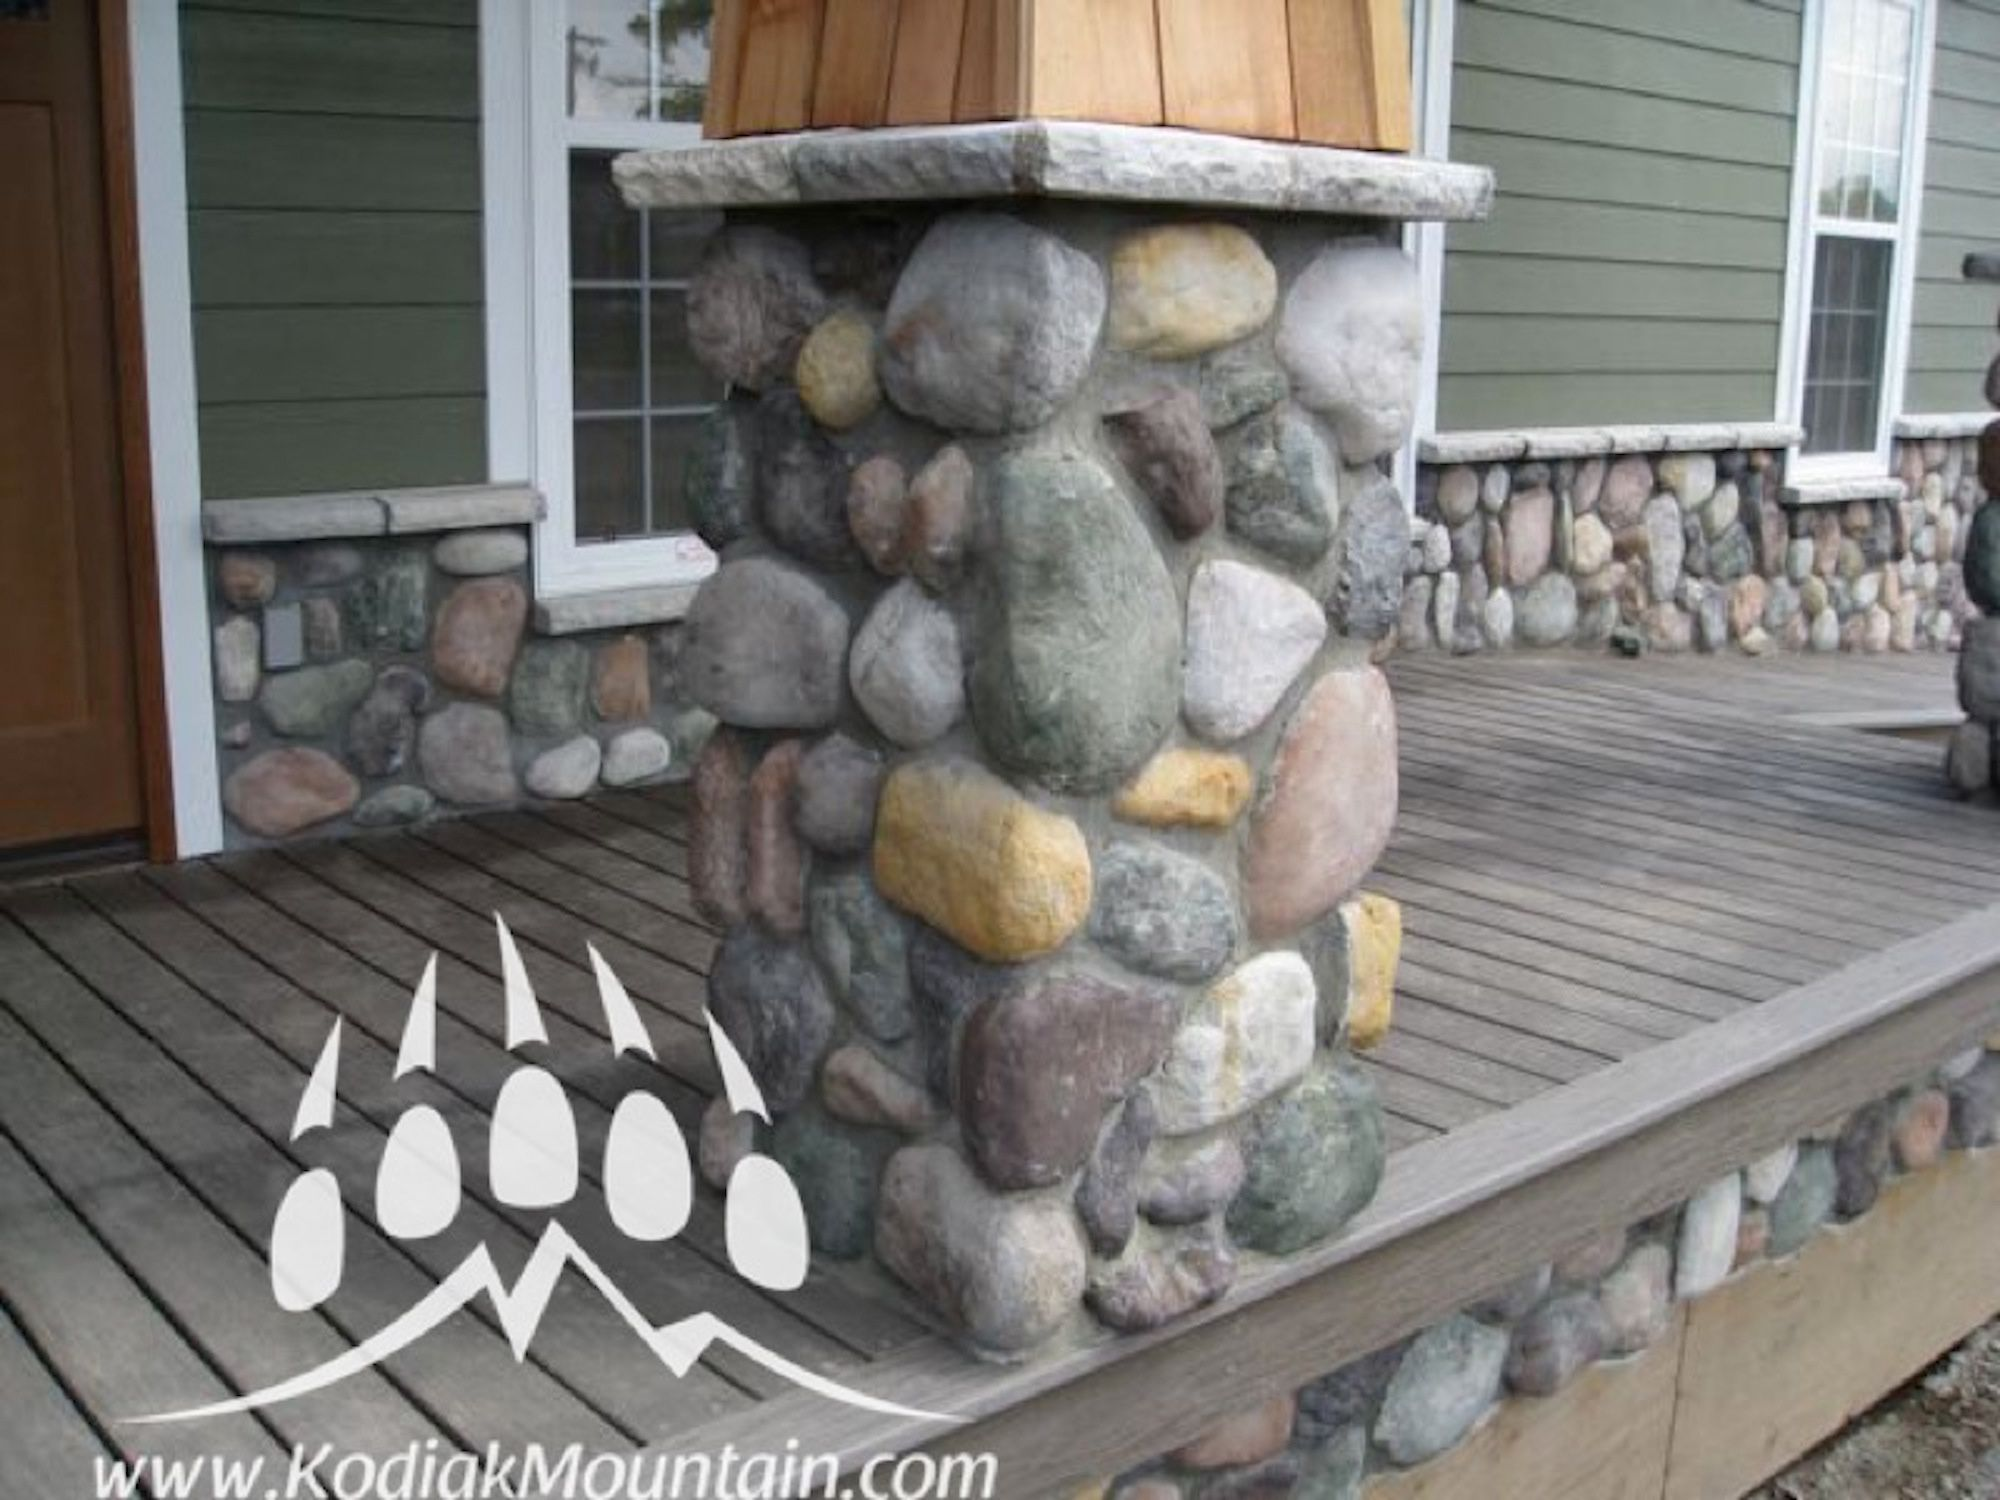 Kodiak Mountain Stone Manufactured Stone Veneer River